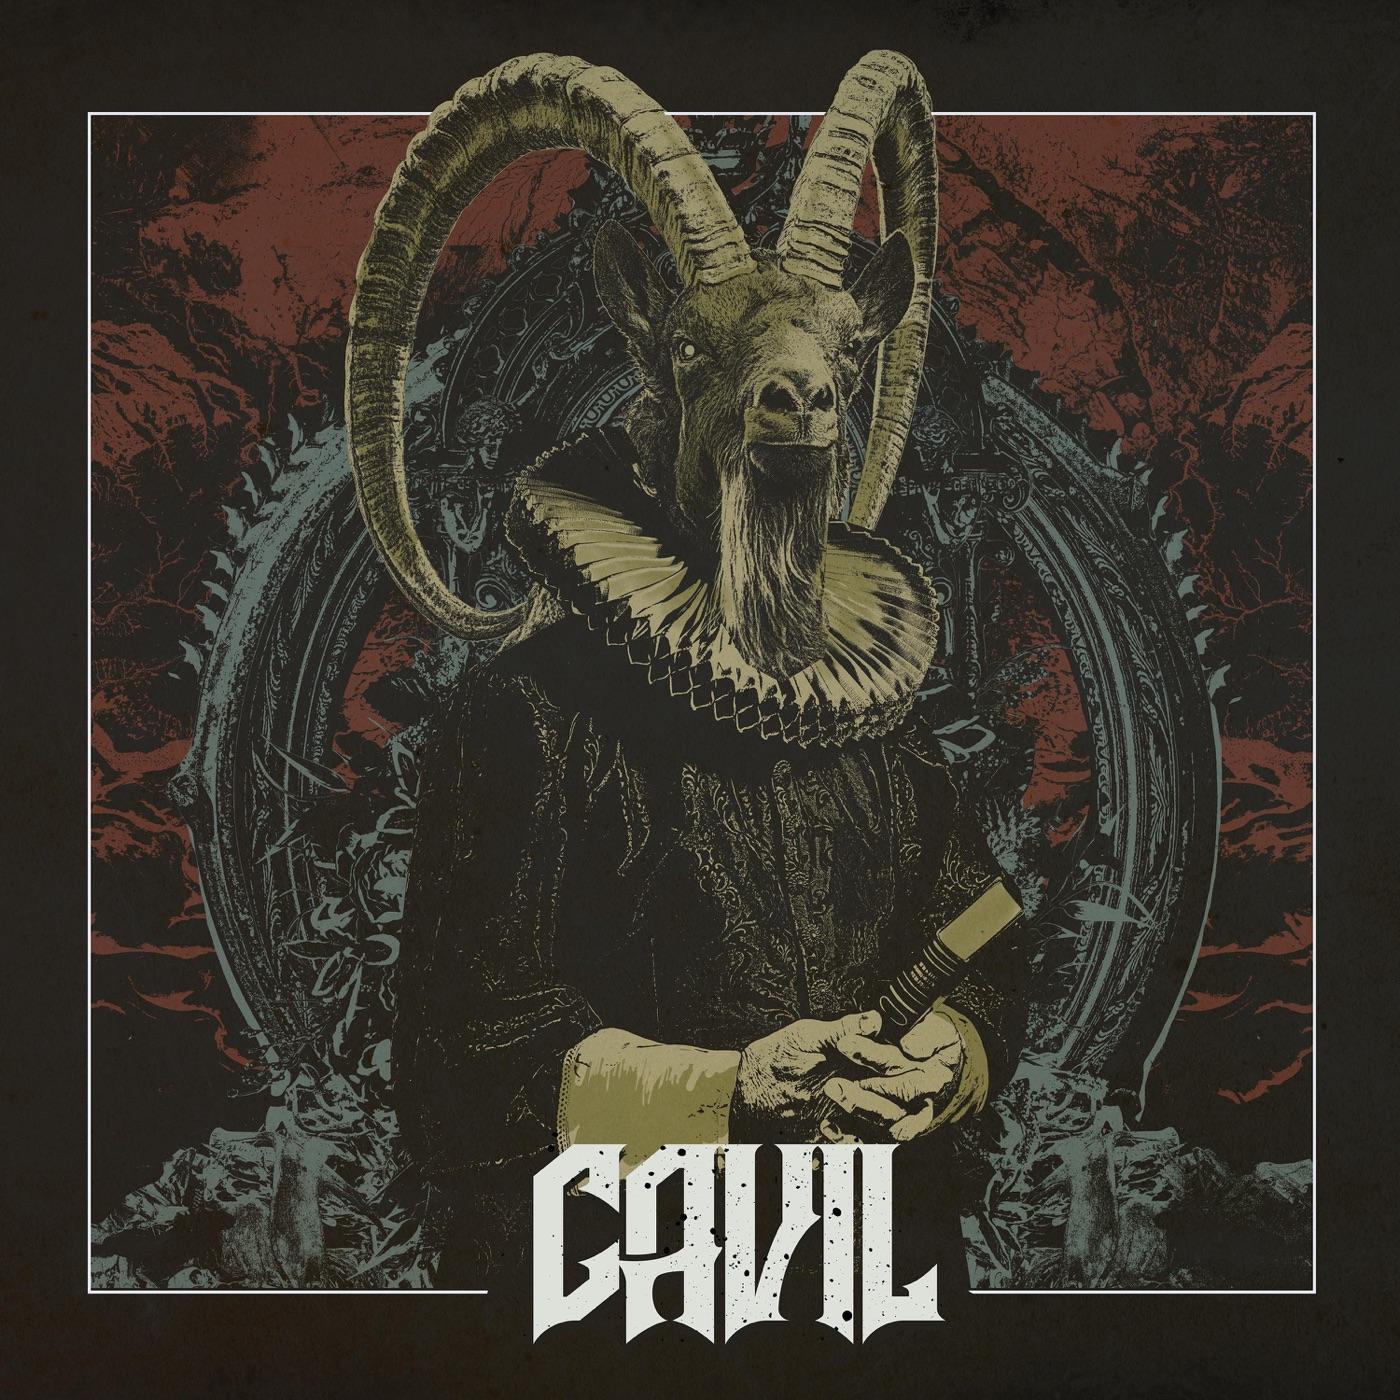 Cavil - Cavil (2017)